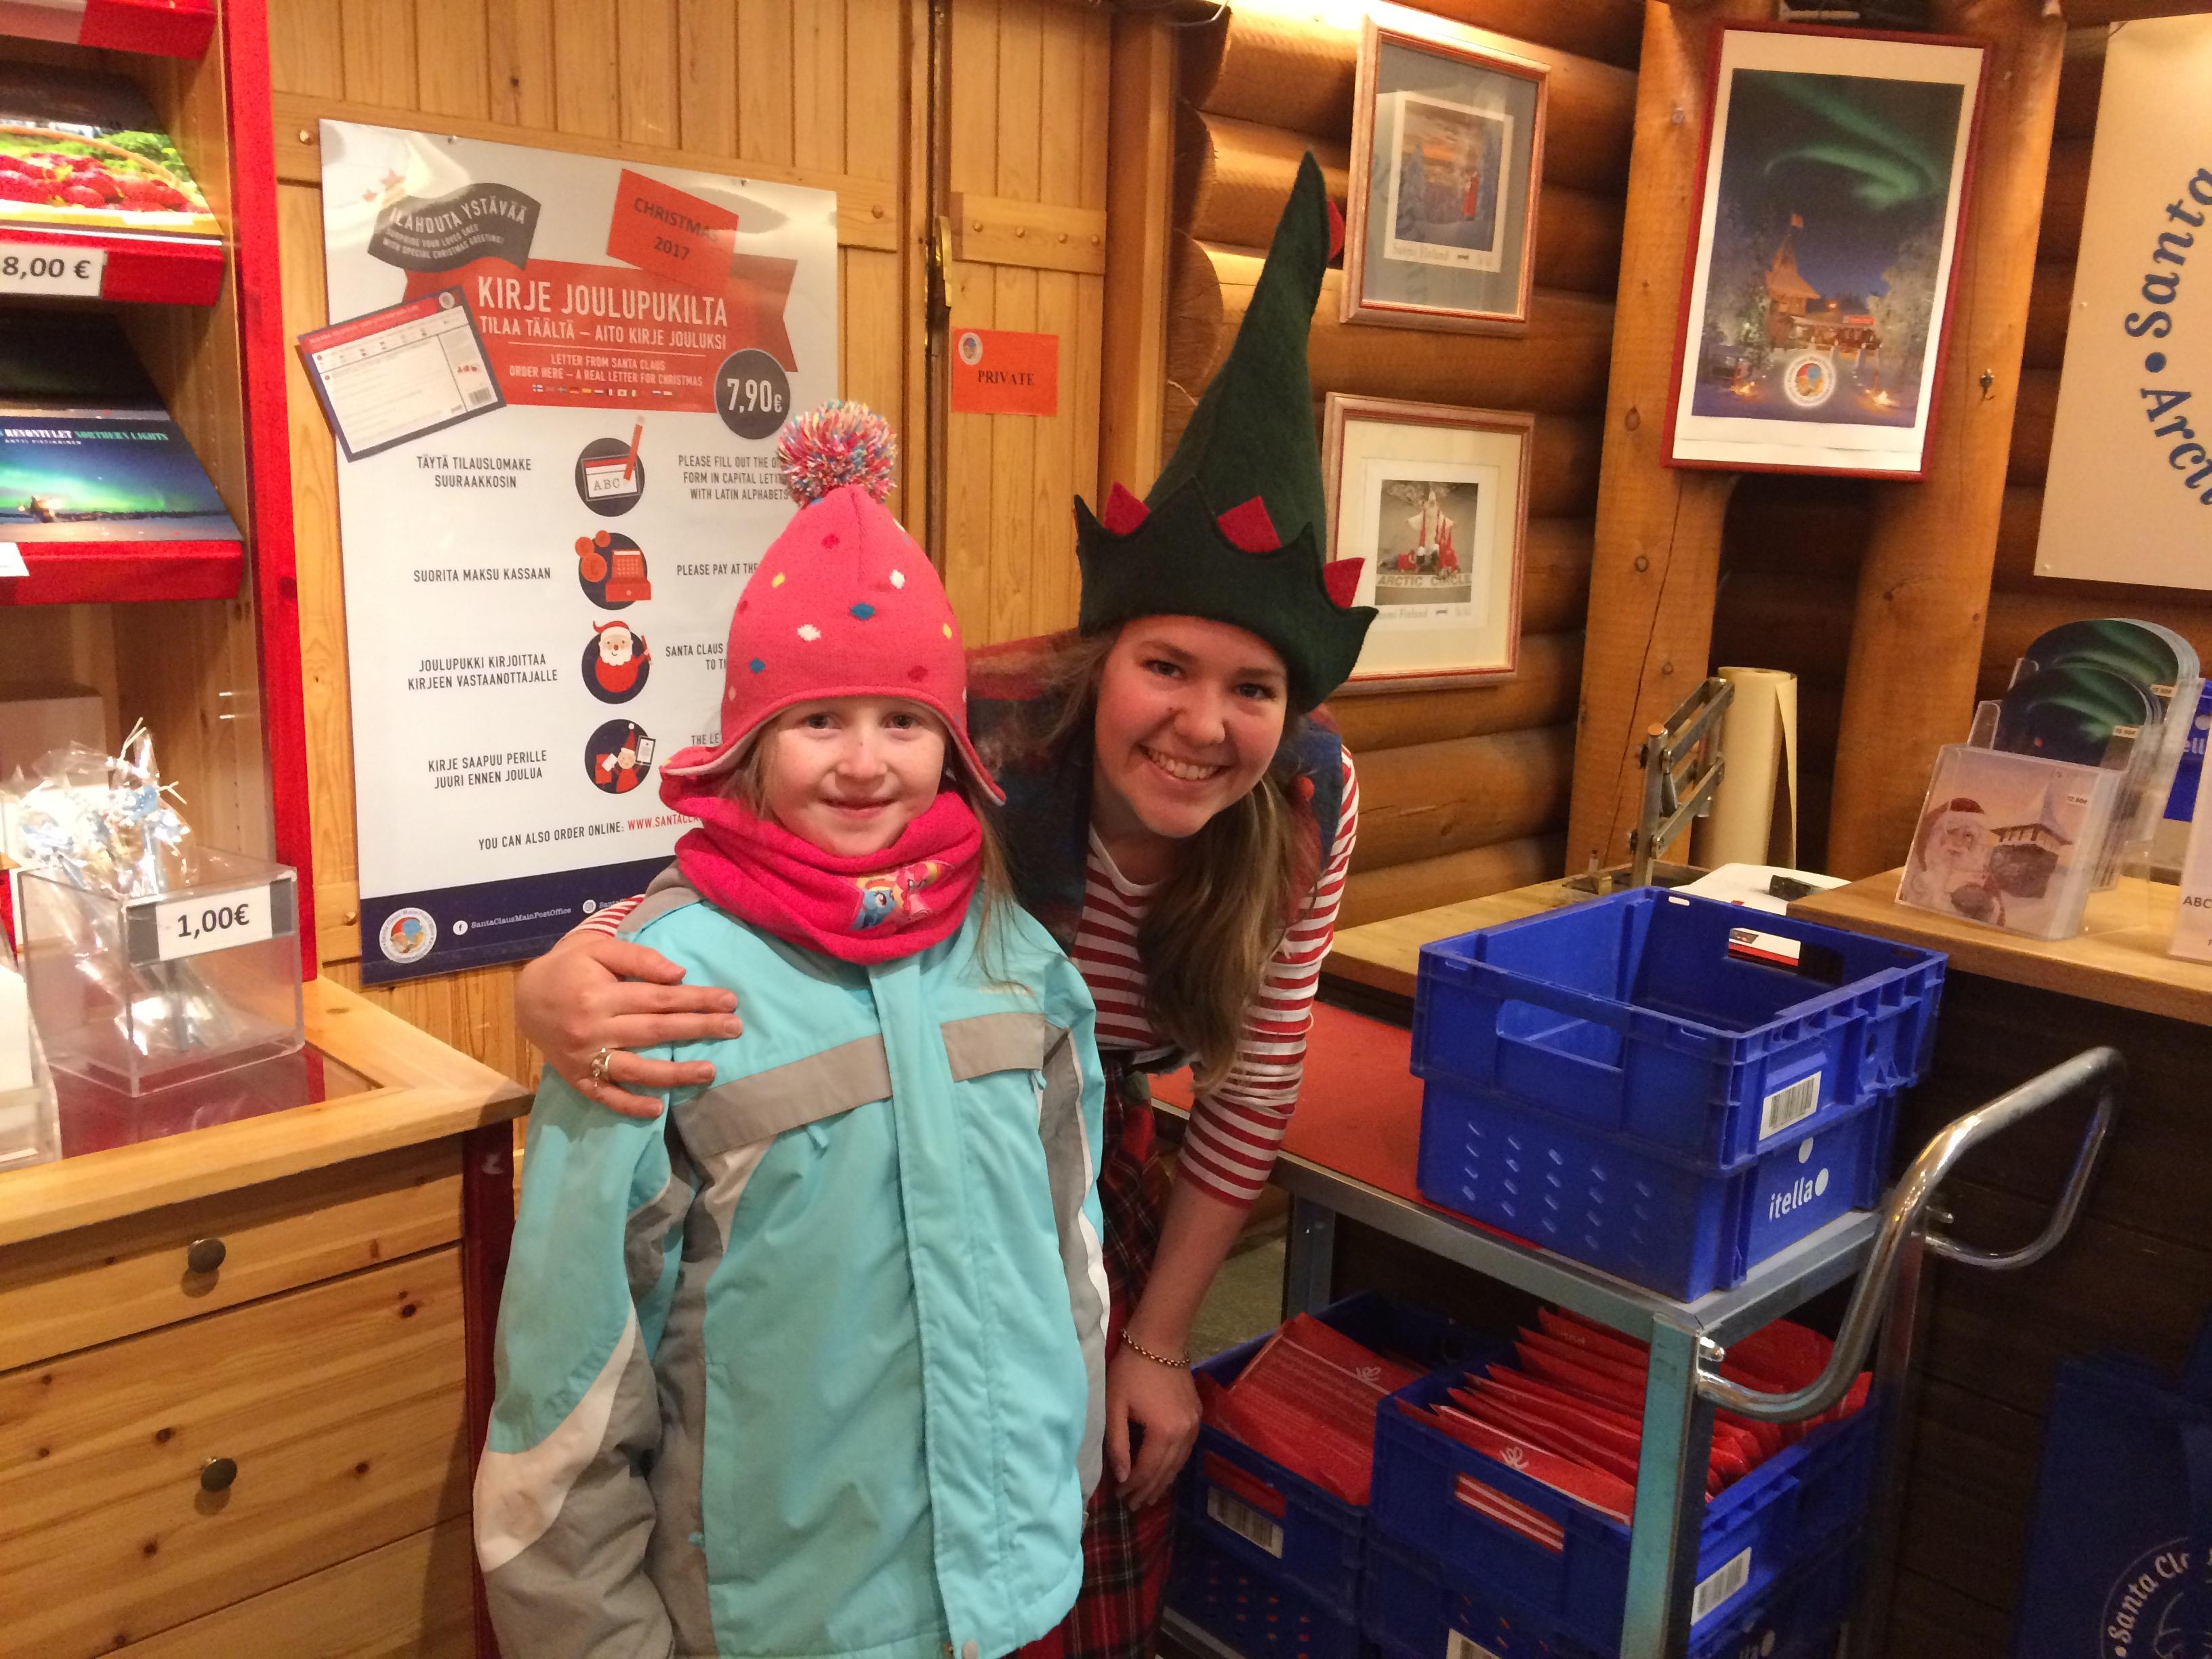 An Elf greets us inside Joulupukin Pääposti at the Santa Holiday Village in Rovaniemi, Finland